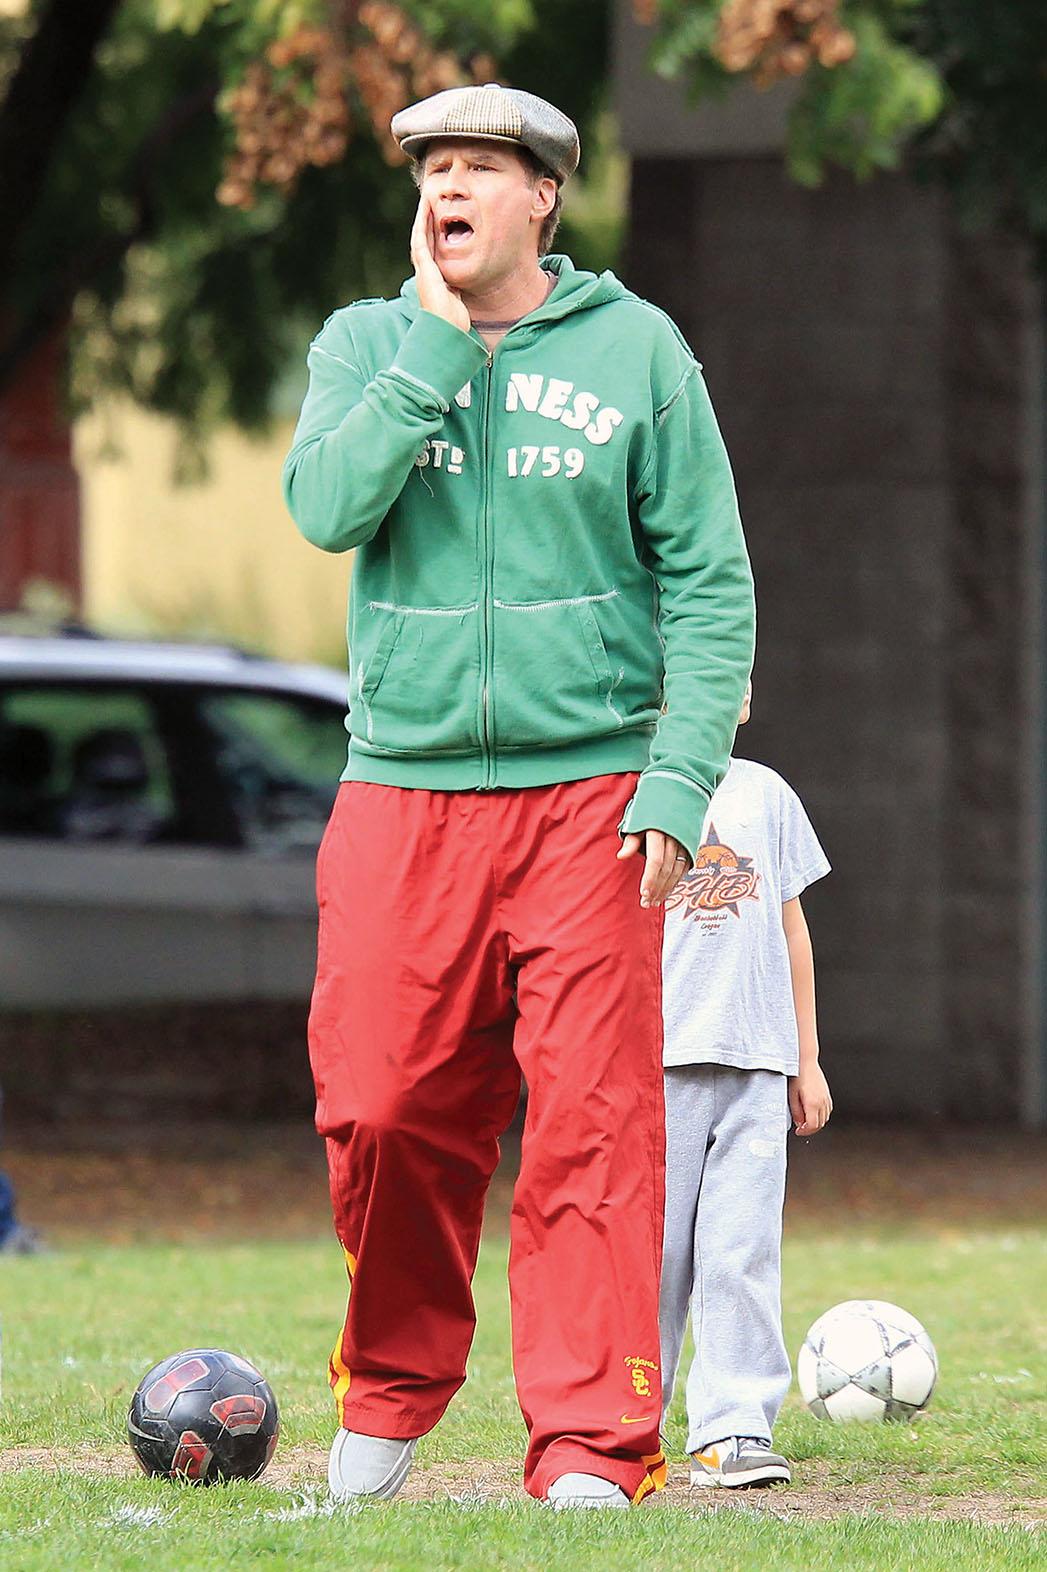 Will_Ferrell_Kids_Sports_Game_ - P 2015